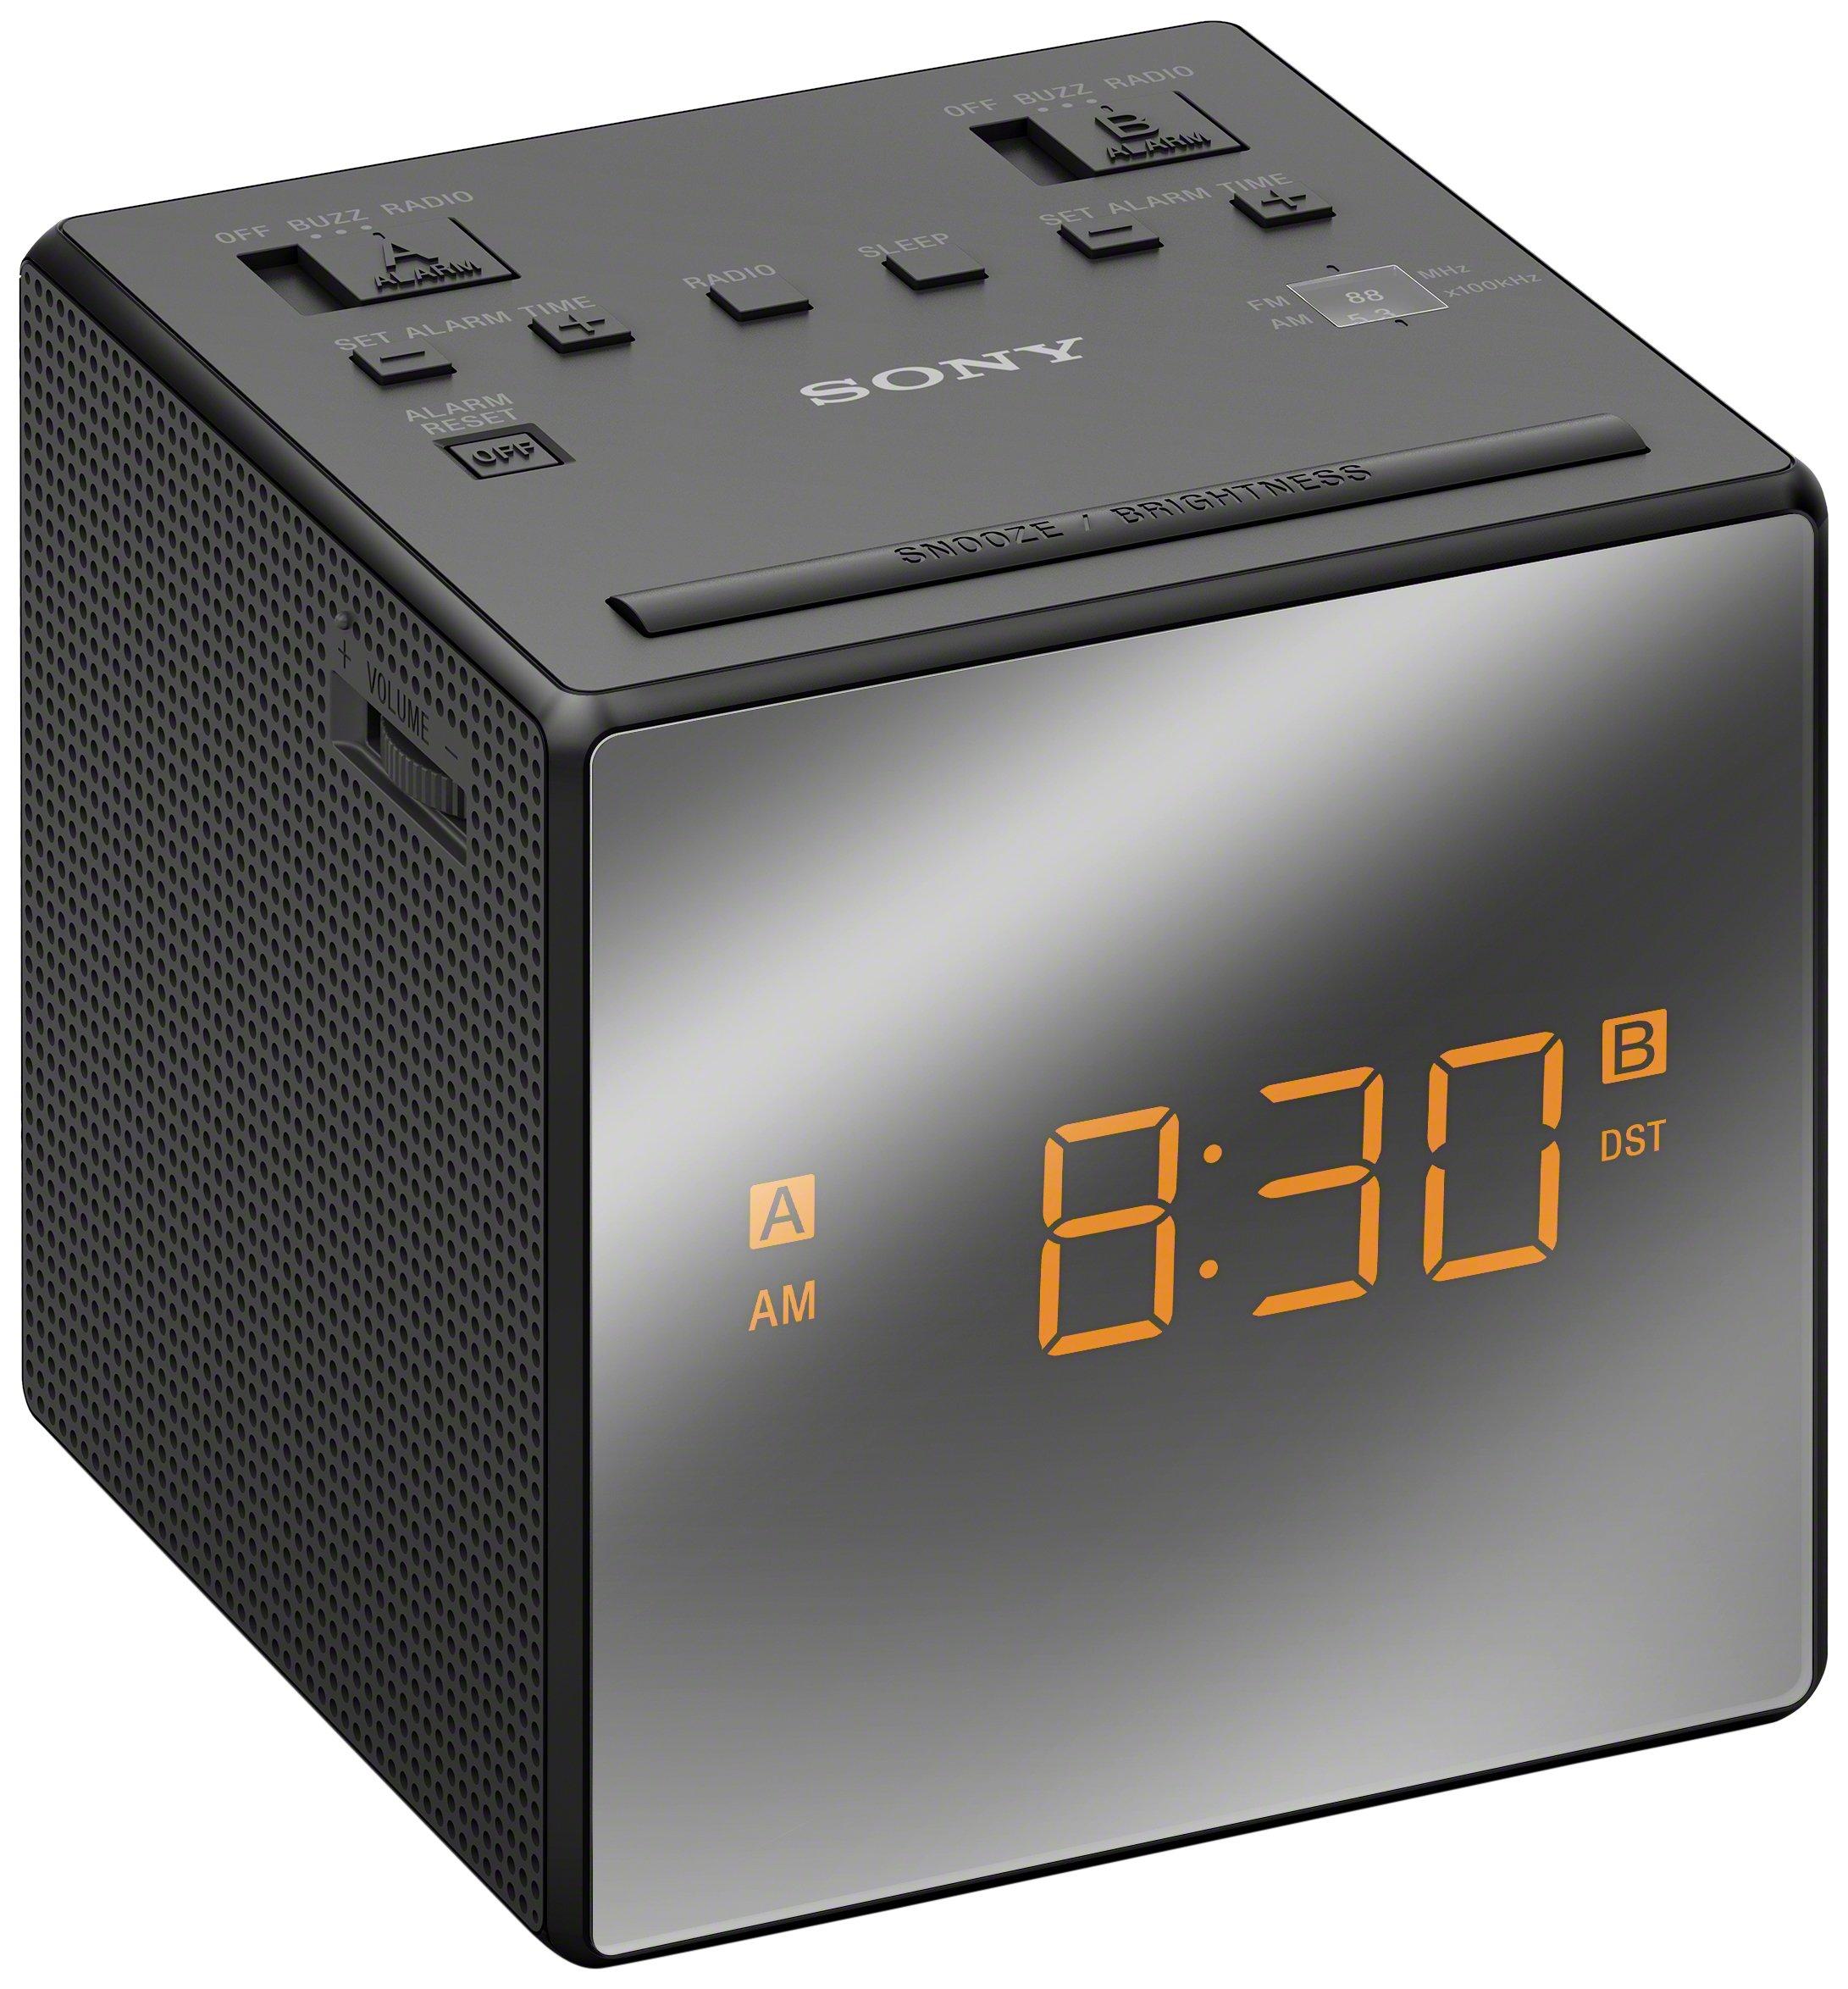 Sony ICFC1TBLACK Alarm Clock Radio, Black by Sony